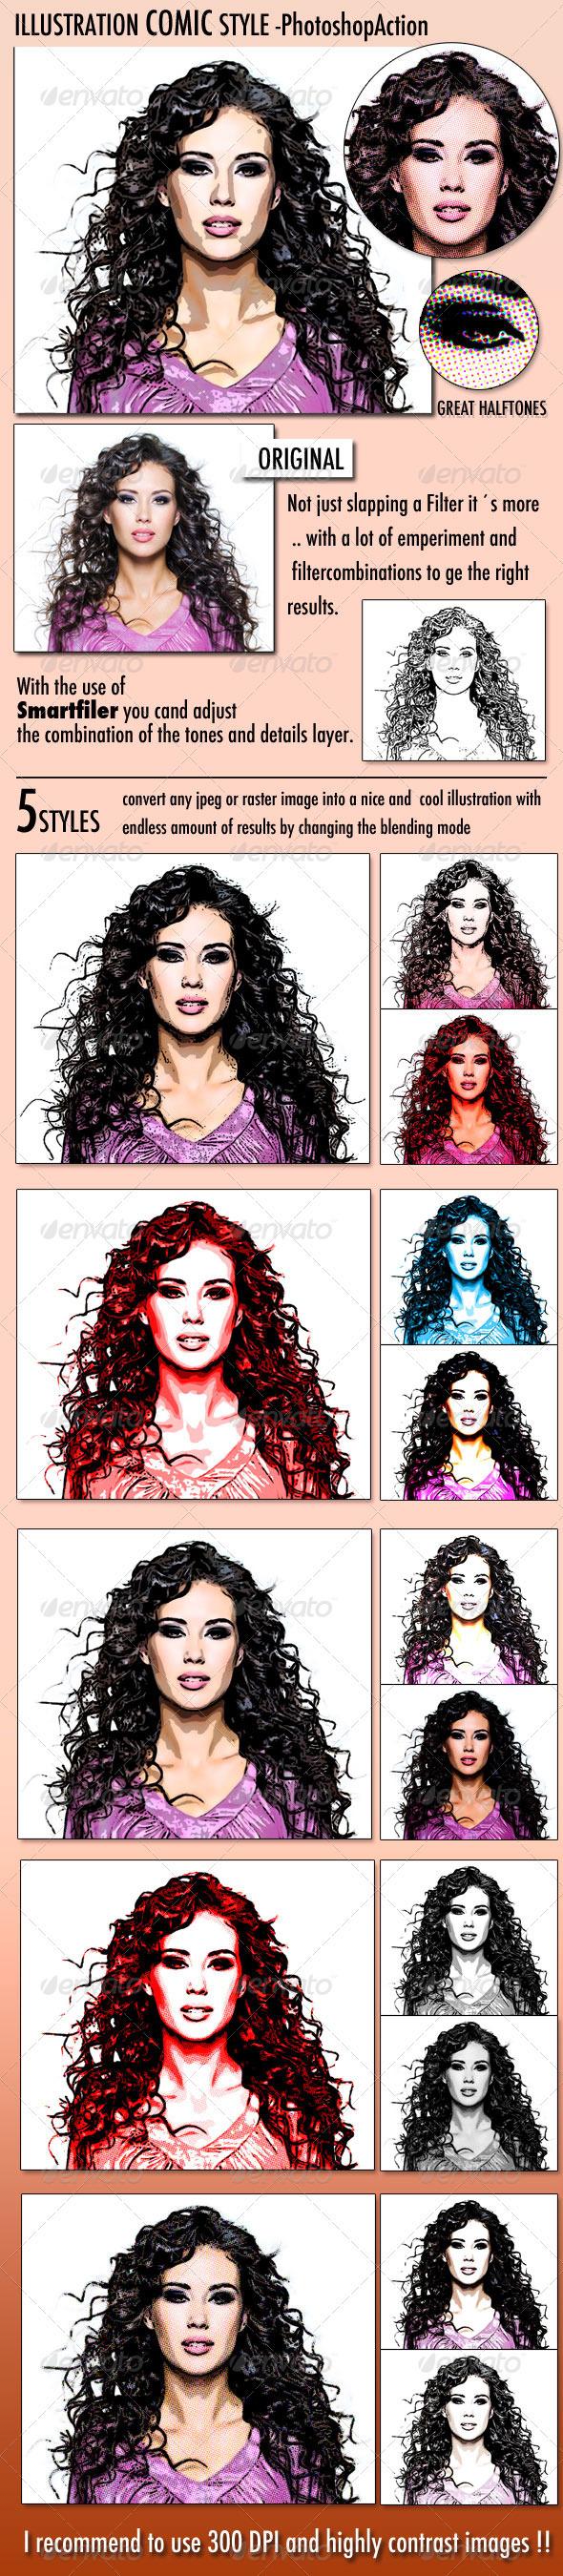 GraphicRiver Illustration Comic Style 674240